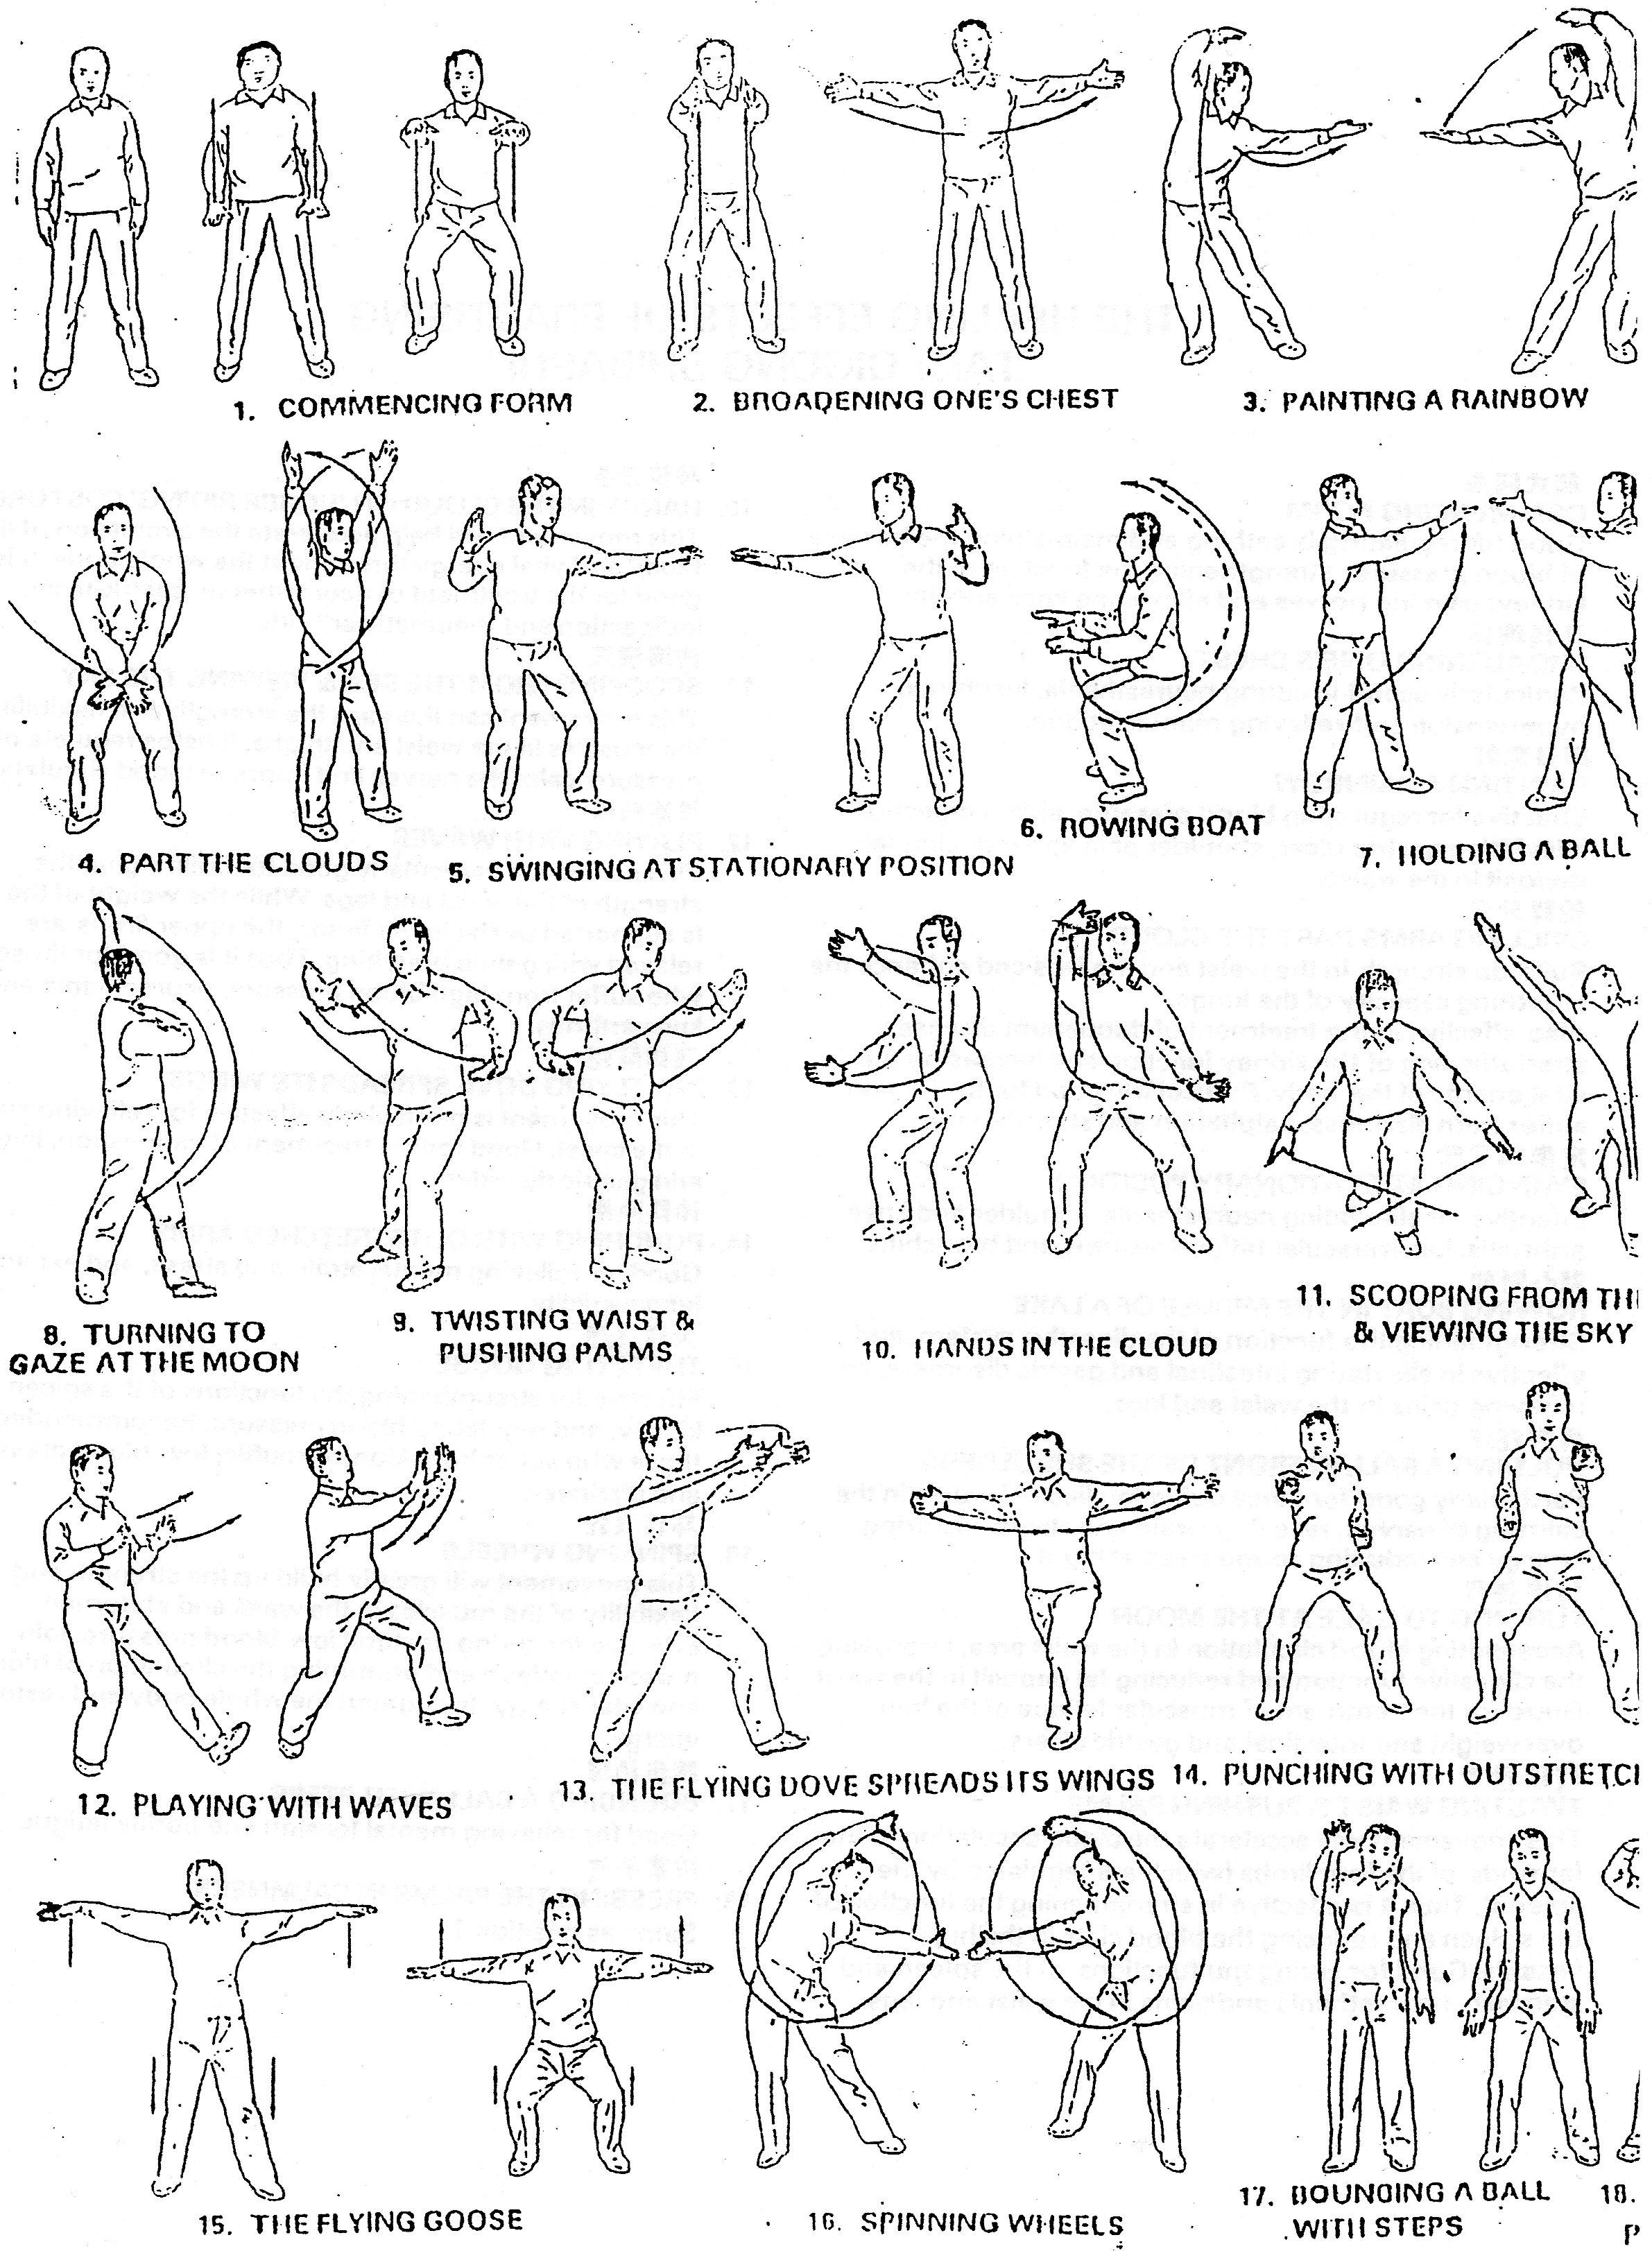 18 Steps Cart of movements.jpg